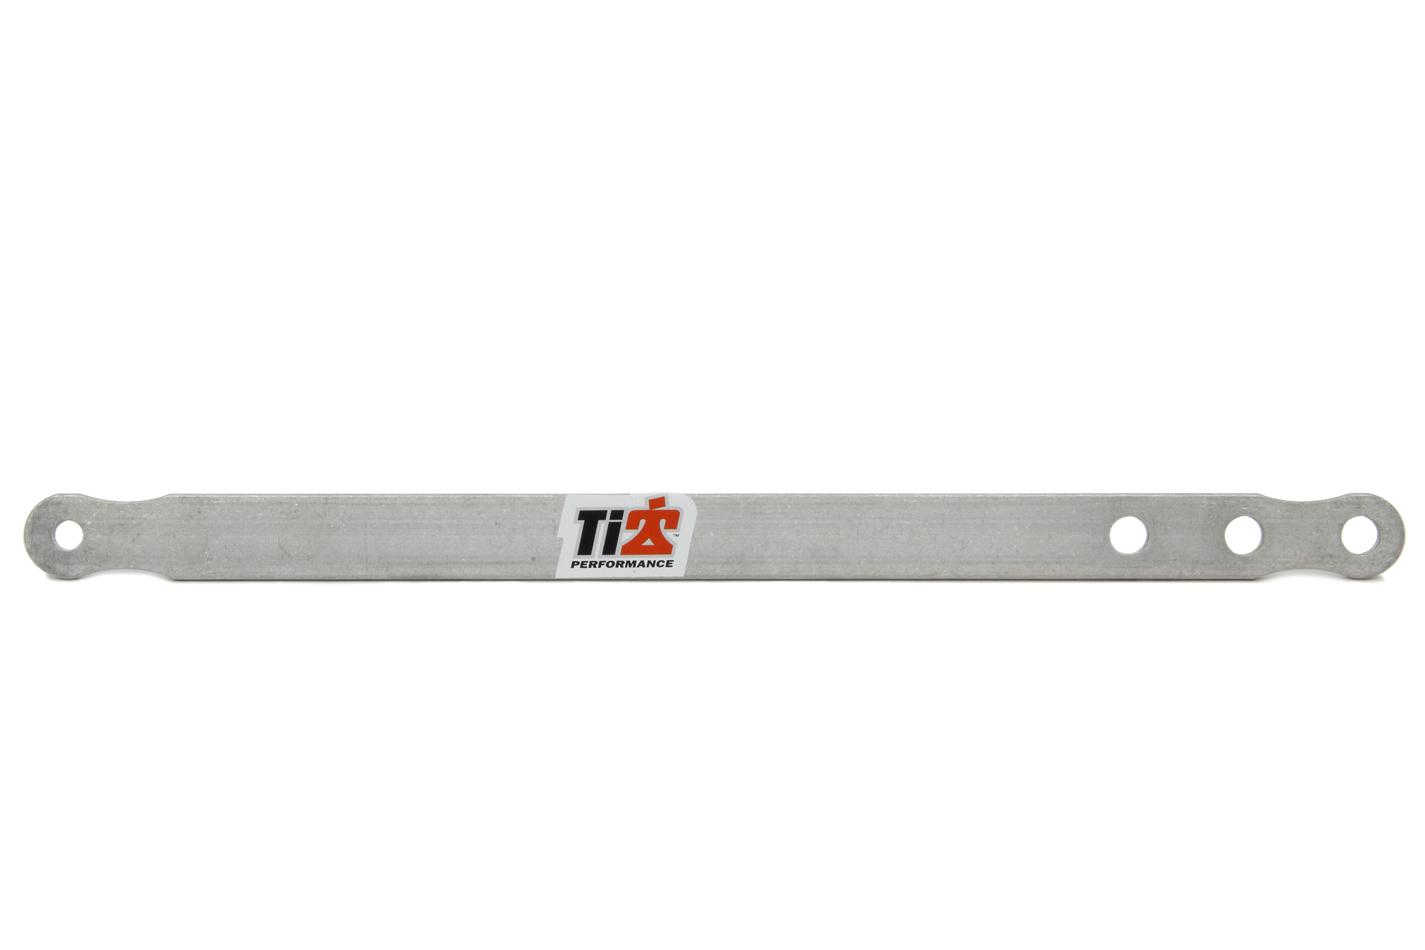 Ti22 PERFORMANCE 600 Alum Nose Wing Straps 11.5in Long Plain P/N -TIP3780